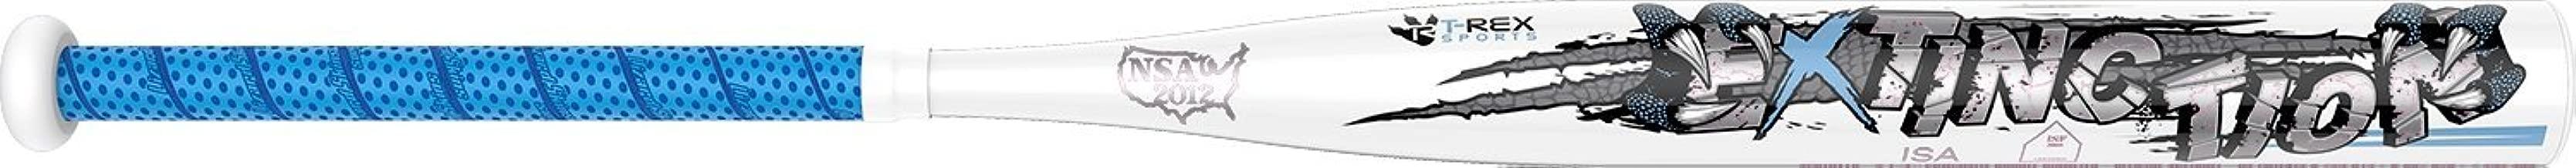 2016 Combat Extinction USSSA Softball Bat